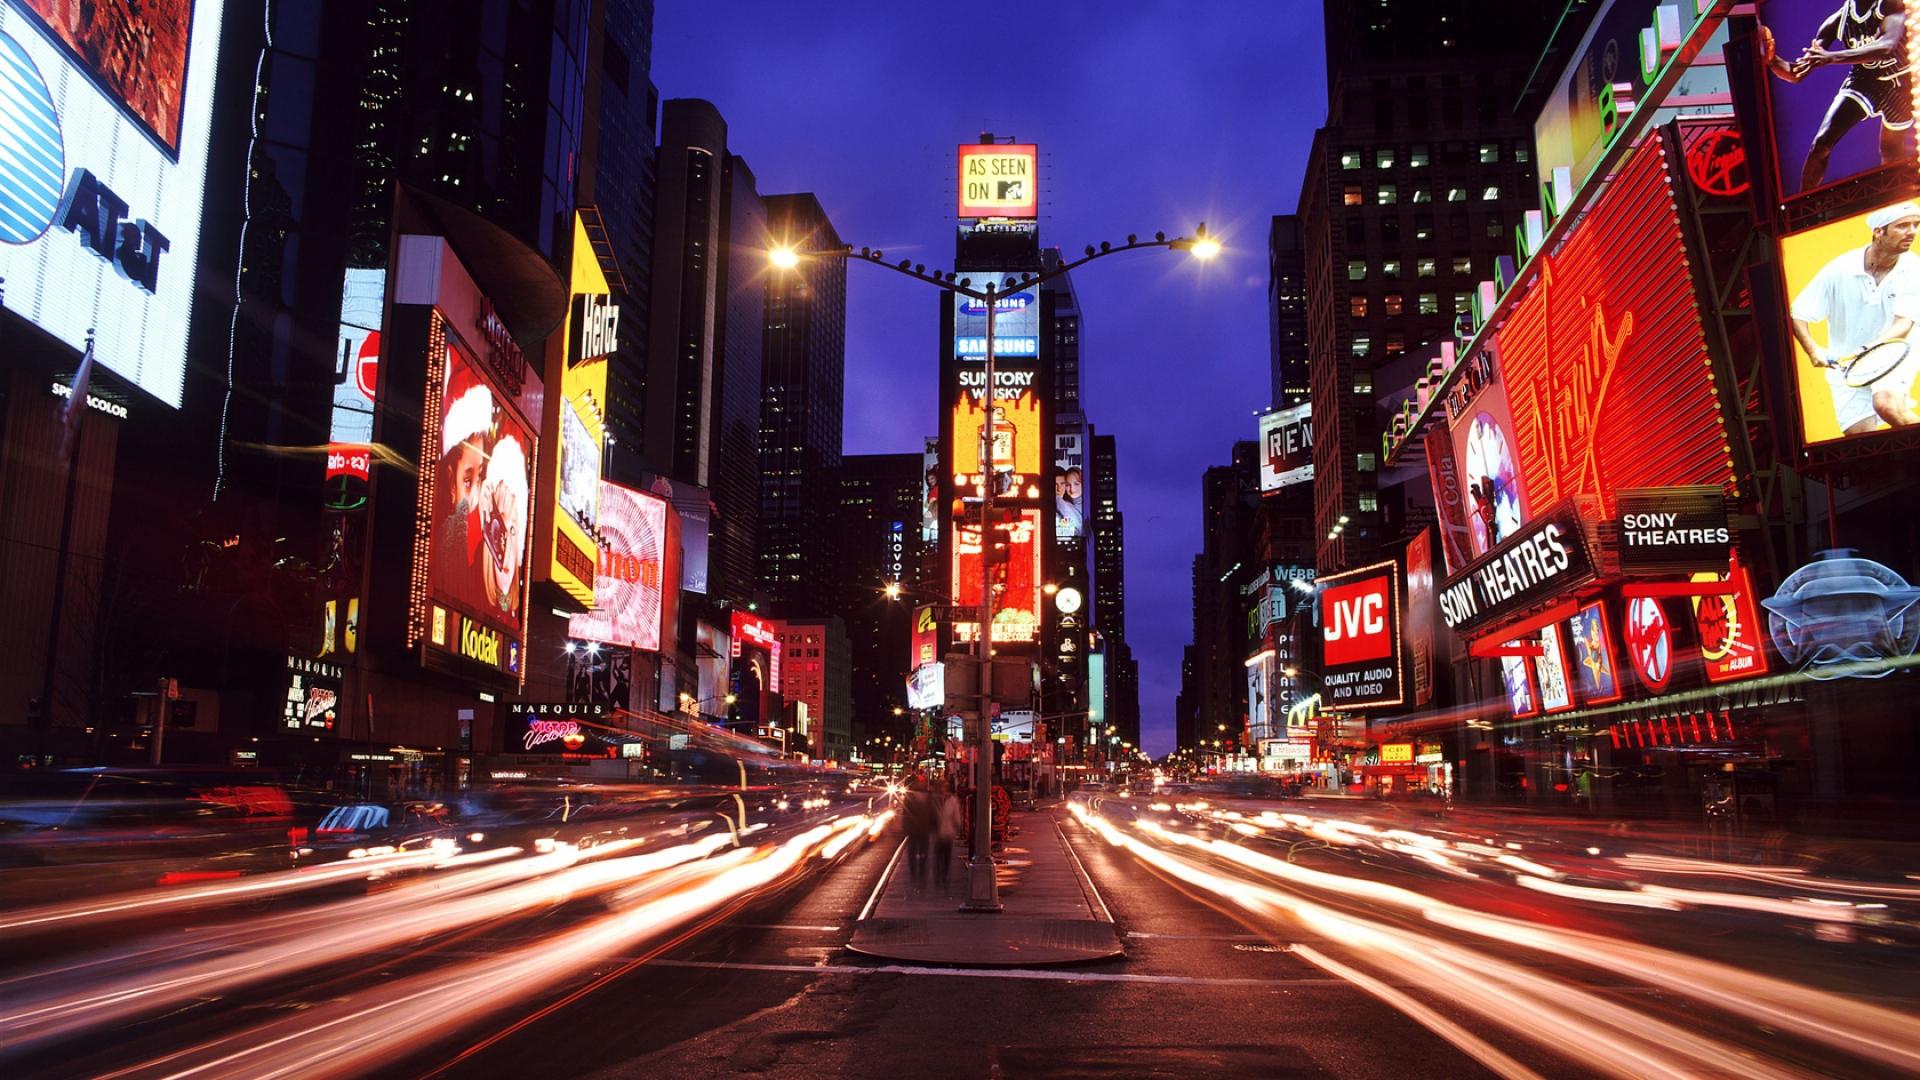 Download Wallpaper 1920x1080 New York Times Square Night City Metropolis Full Hd 1080p Hd Background